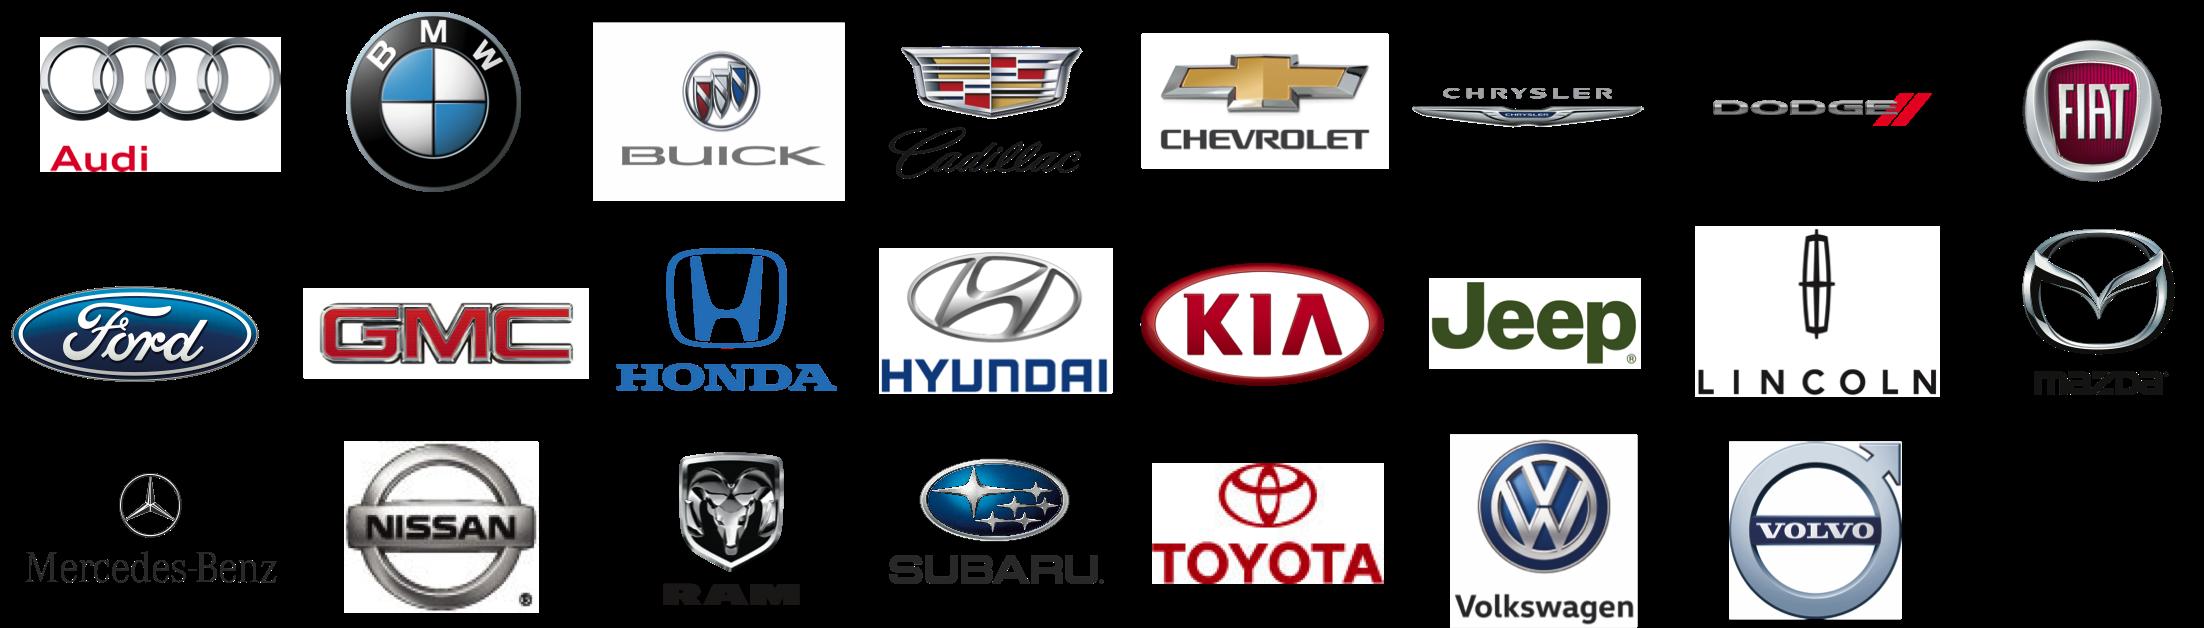 10_17-website-logos